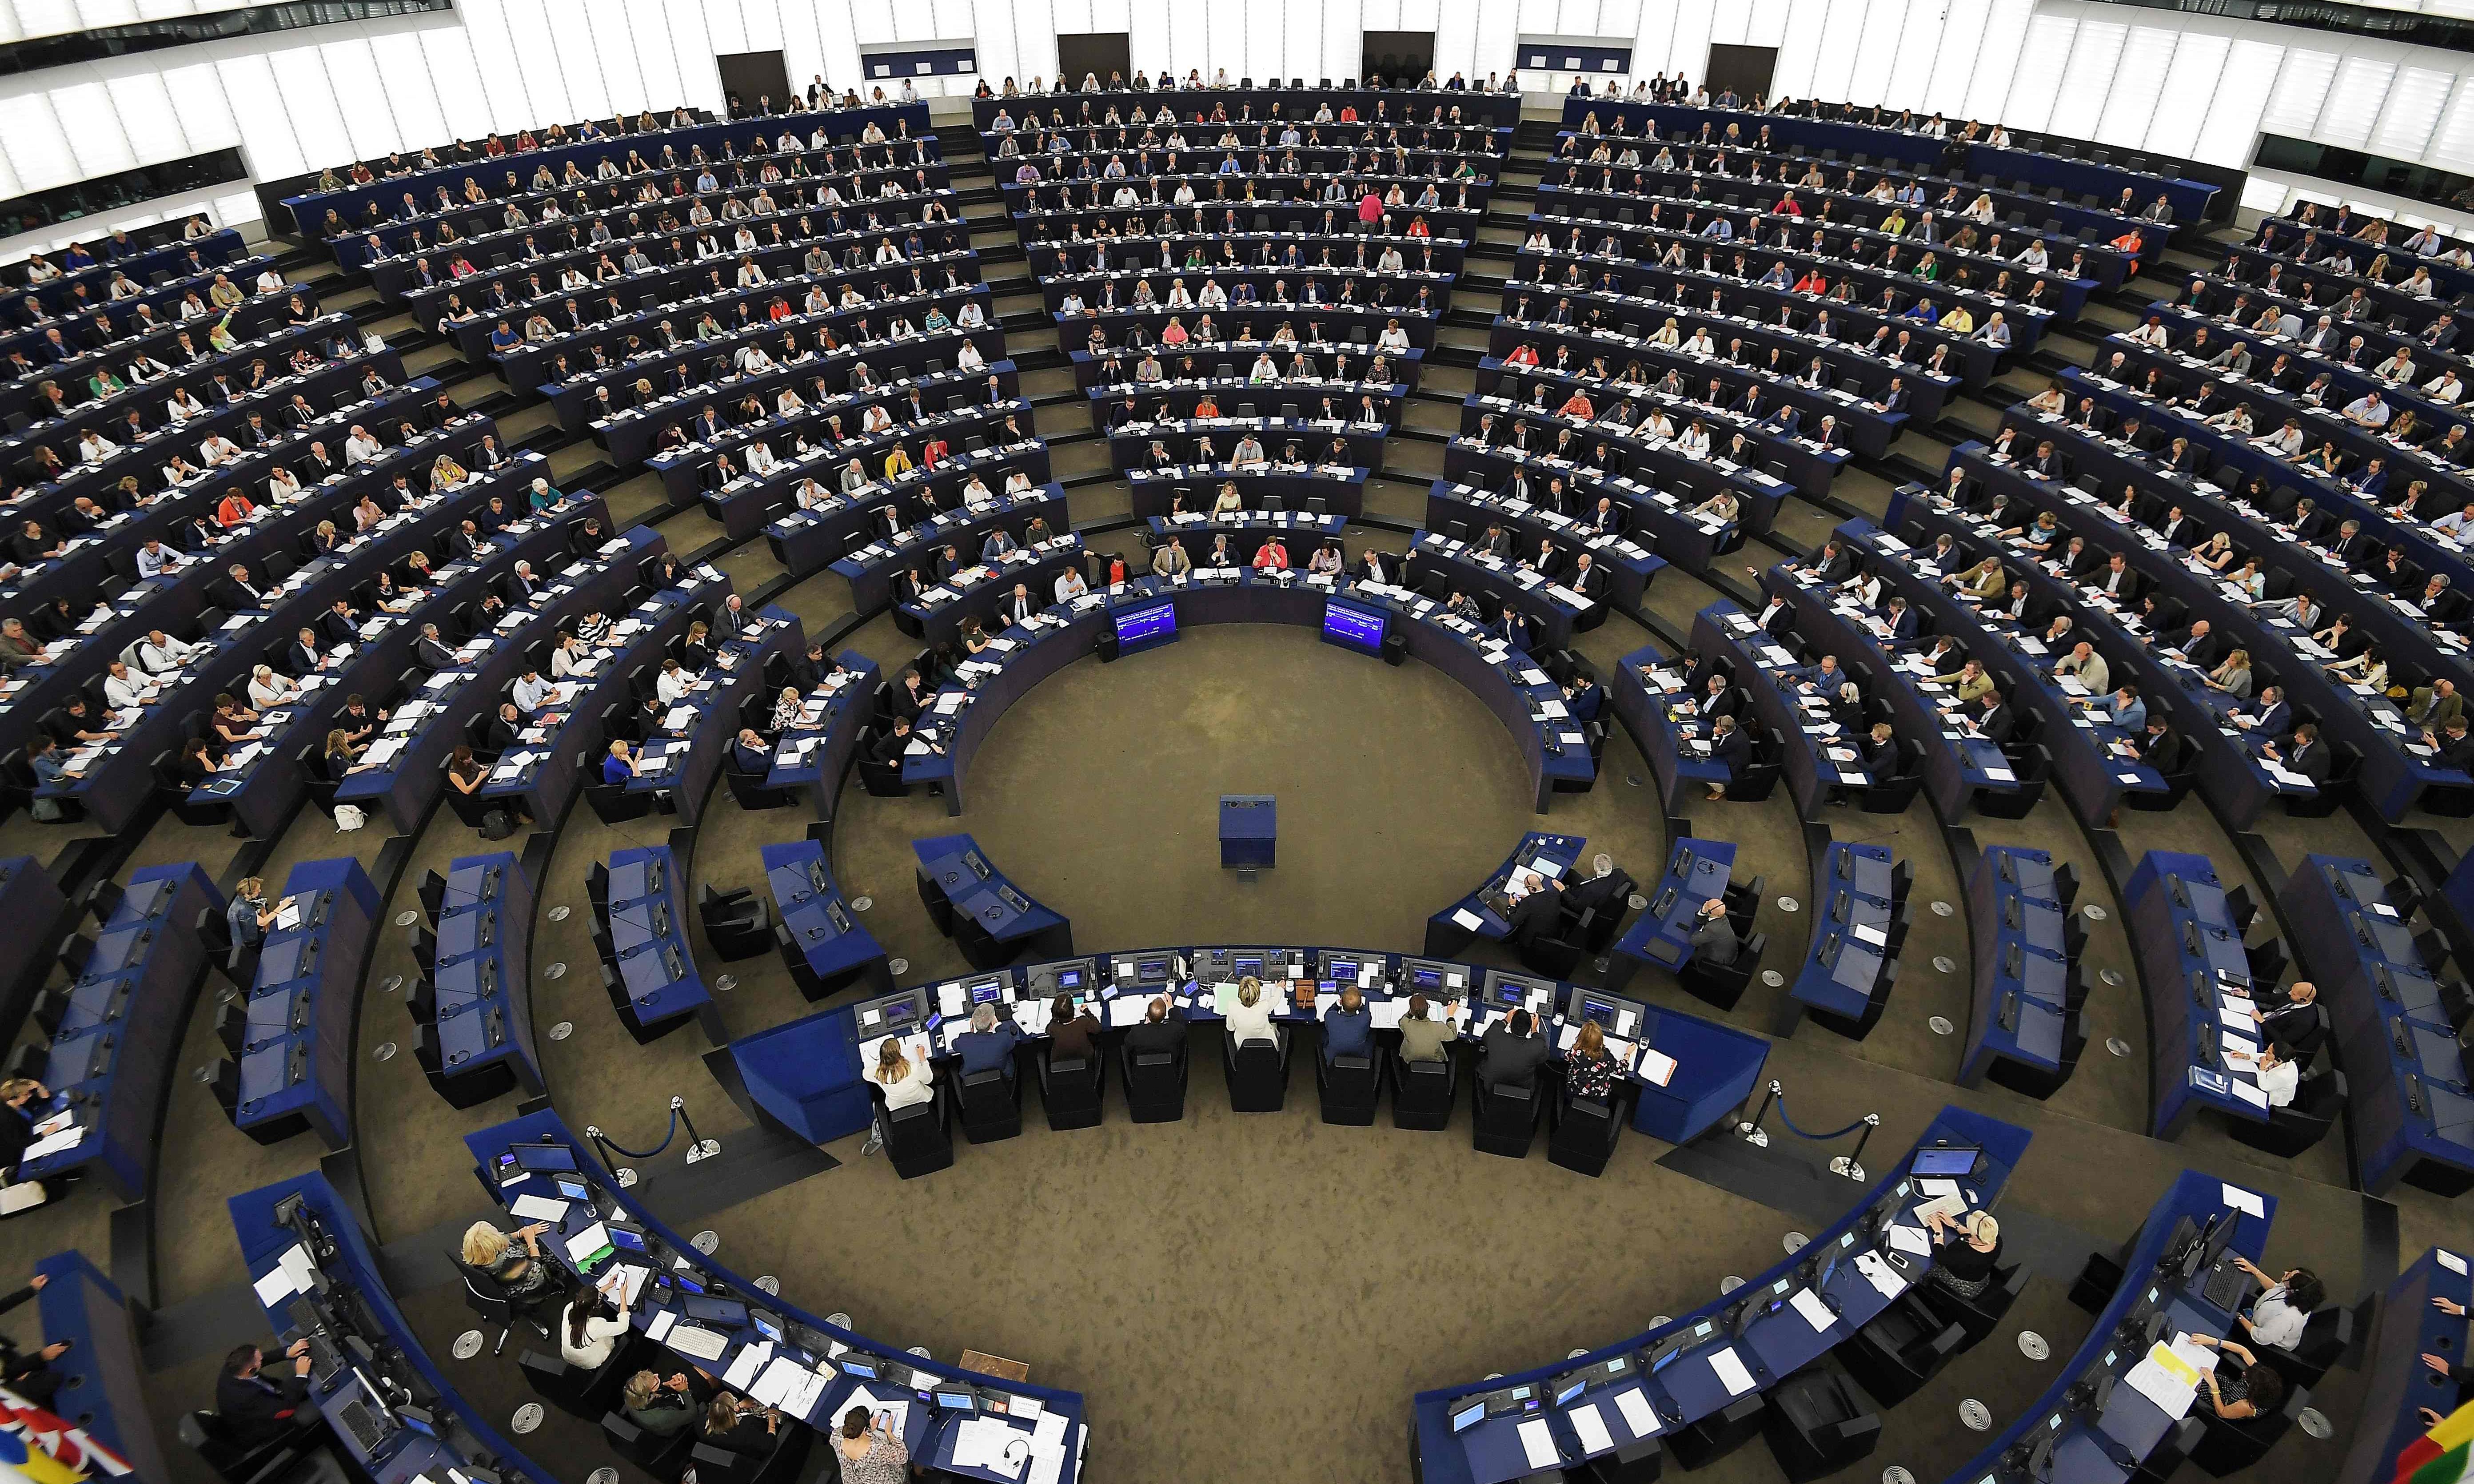 'I intend to serve five years': British MEPs take senior posts despite Brexit